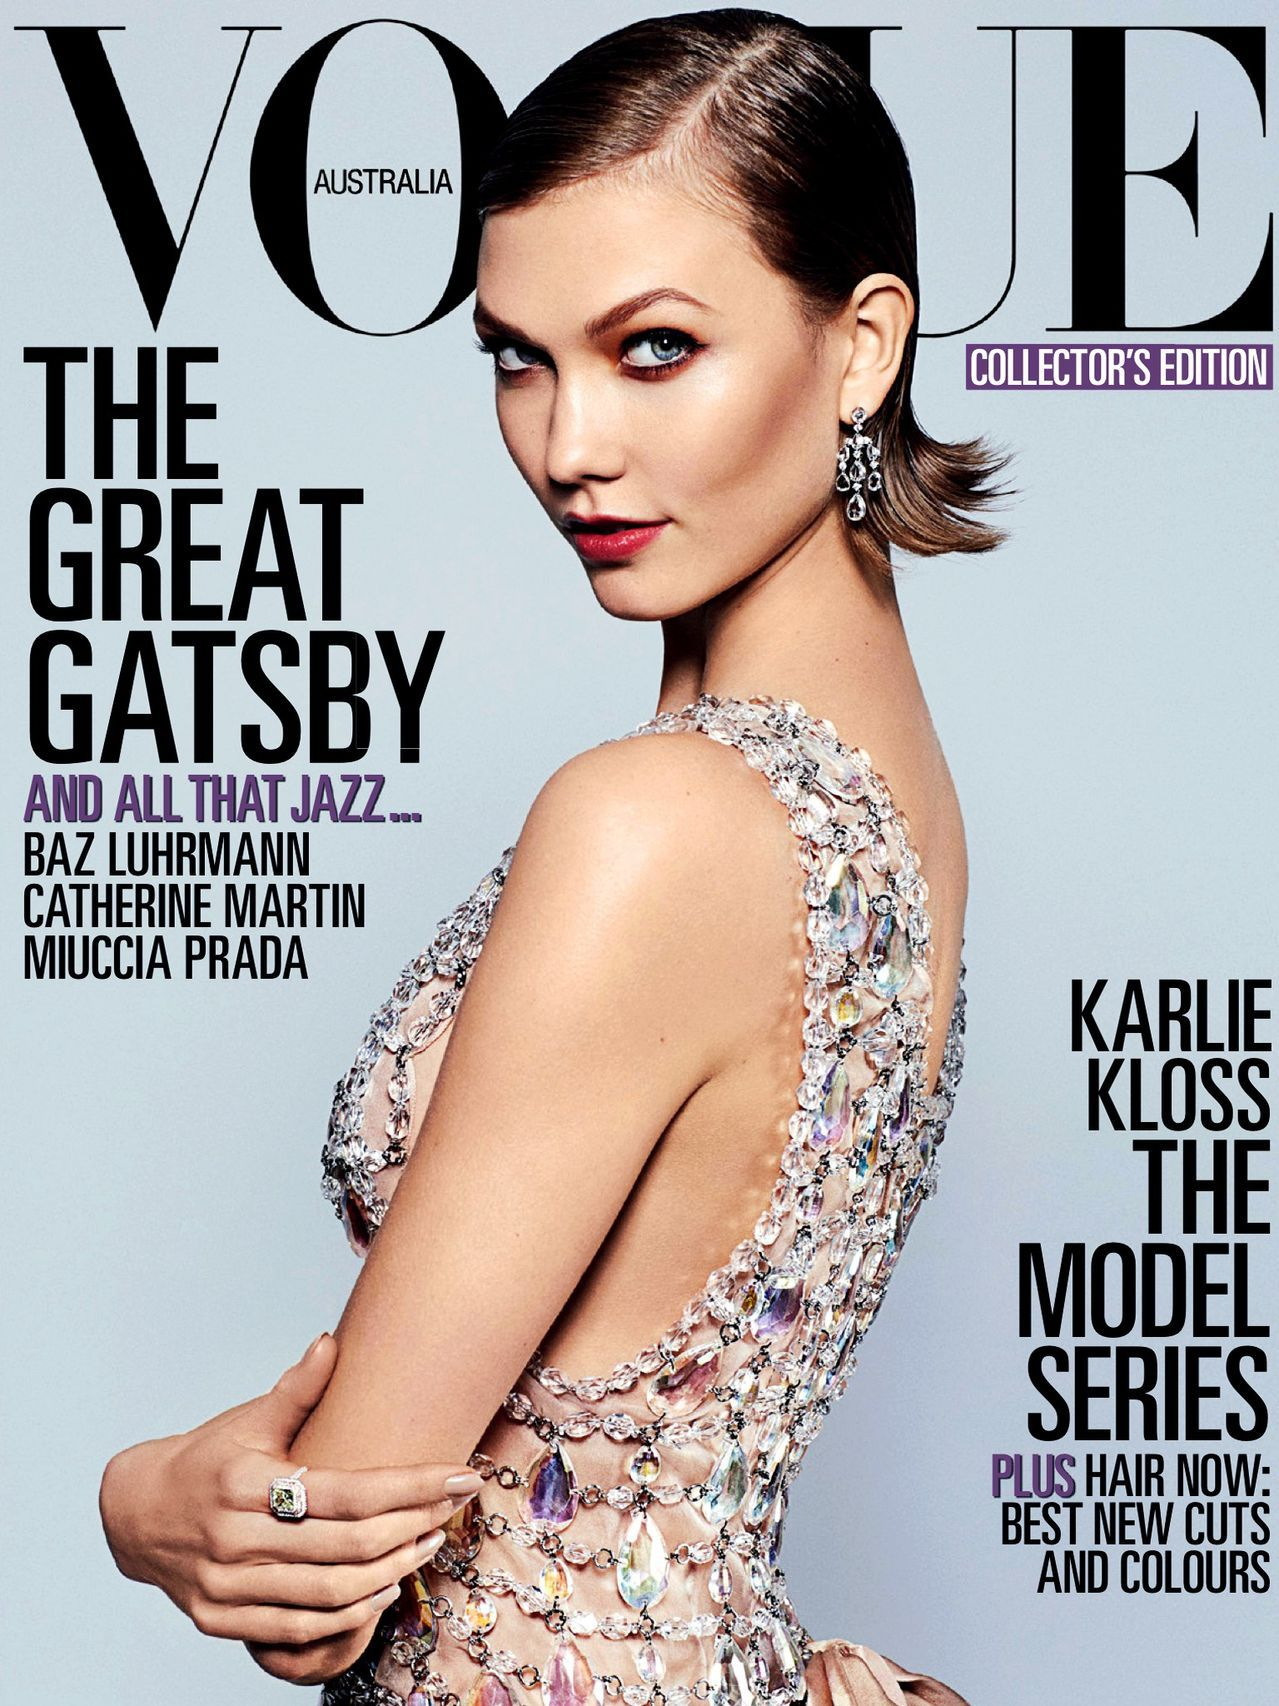 Vogue Australia, May 2013. #vogue